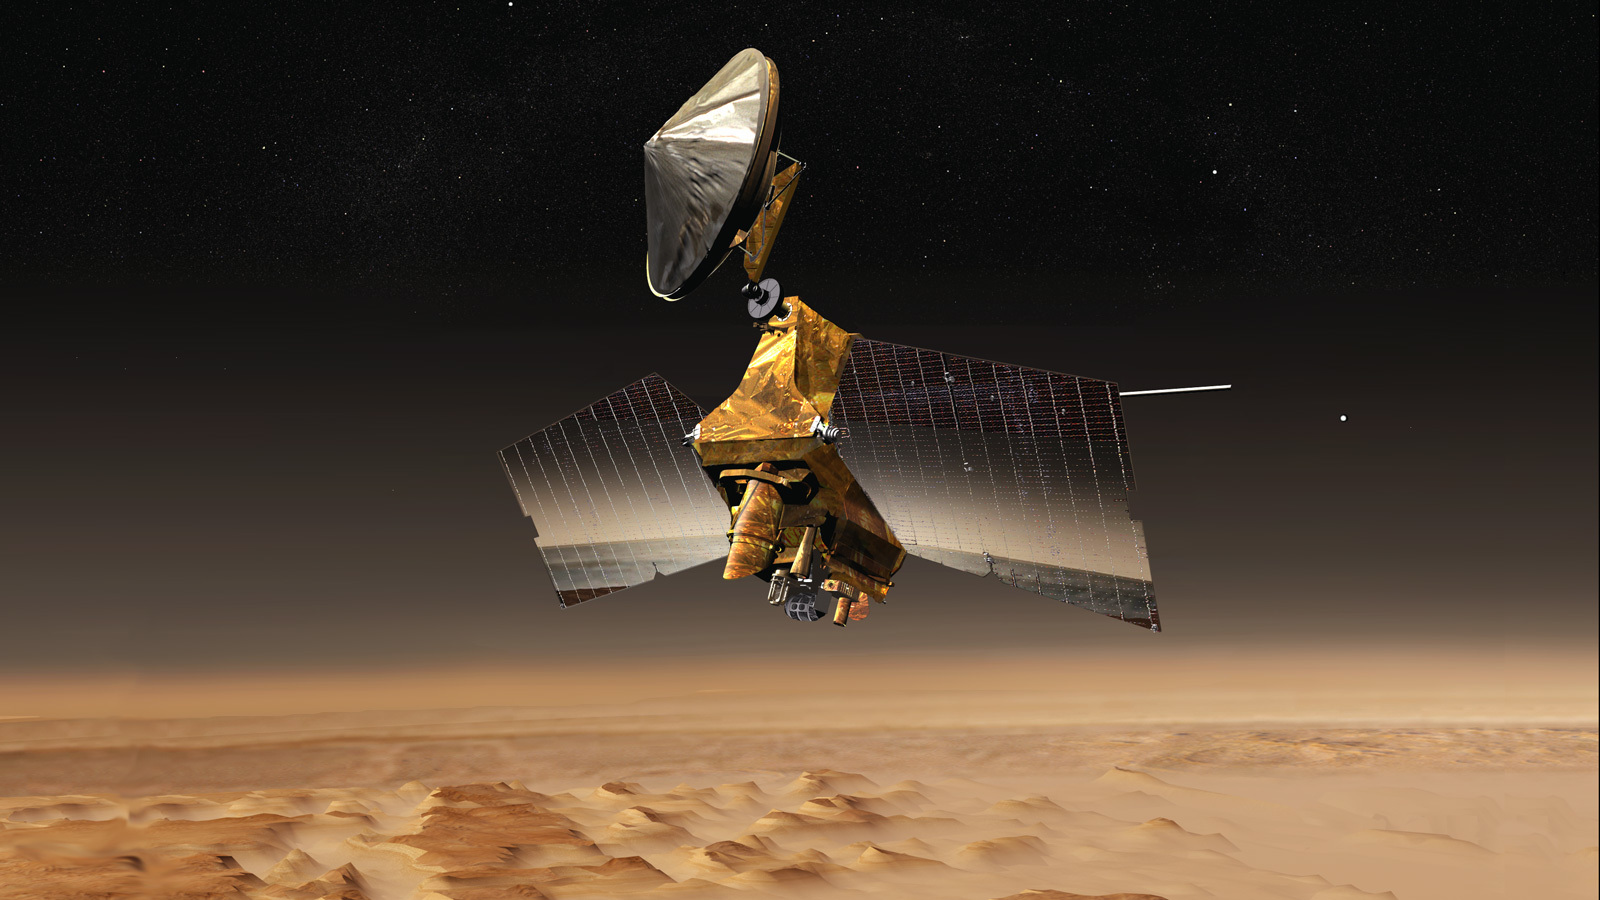 Read article: NASA's Mars Reconnaissance Orbiter Undergoes Memory Update